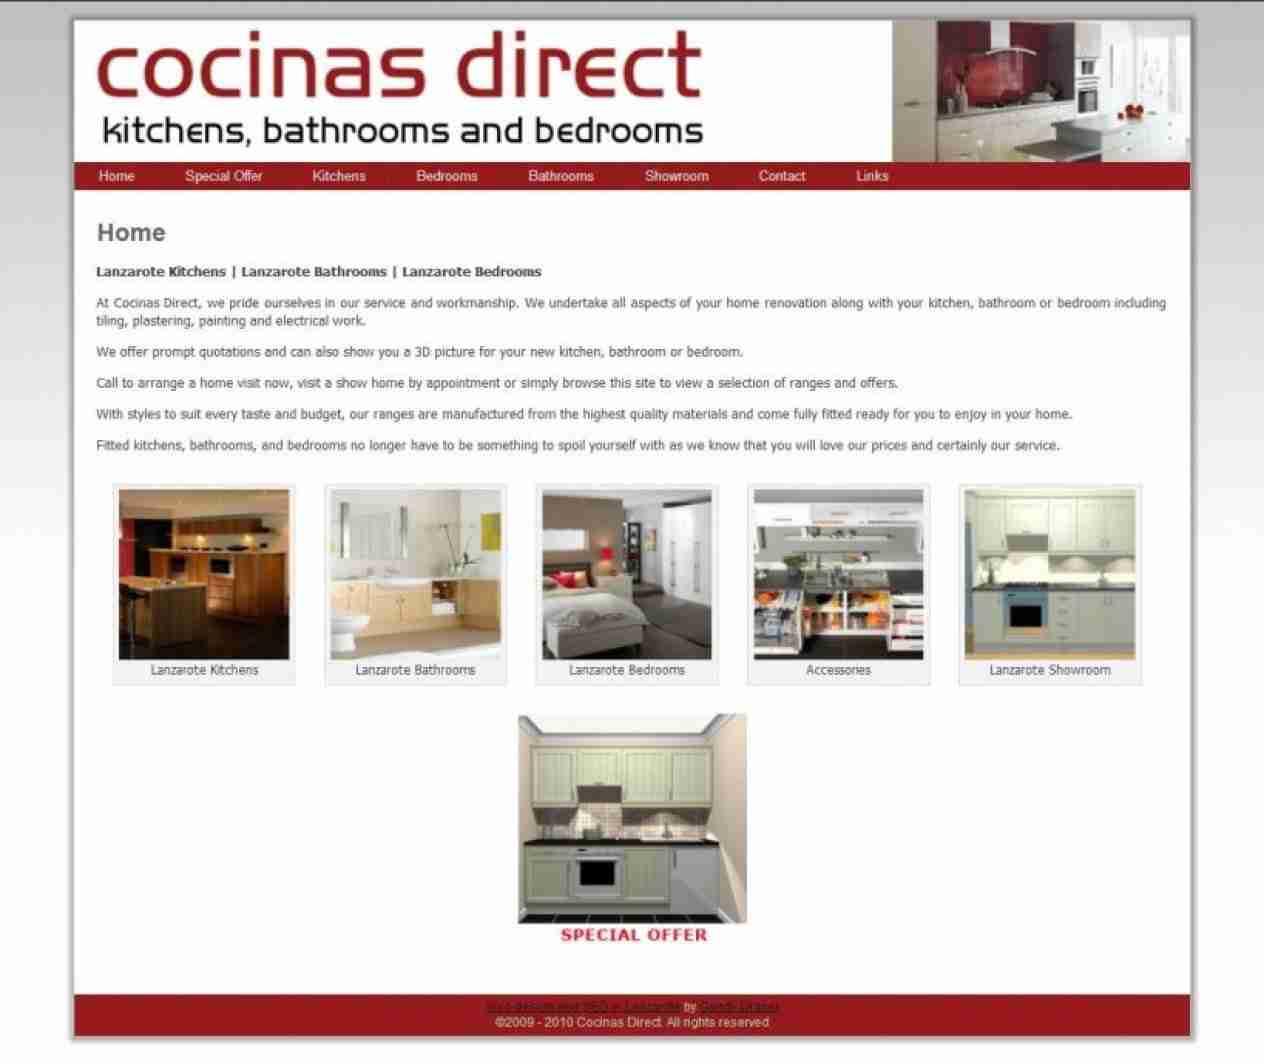 Cocinas Direct